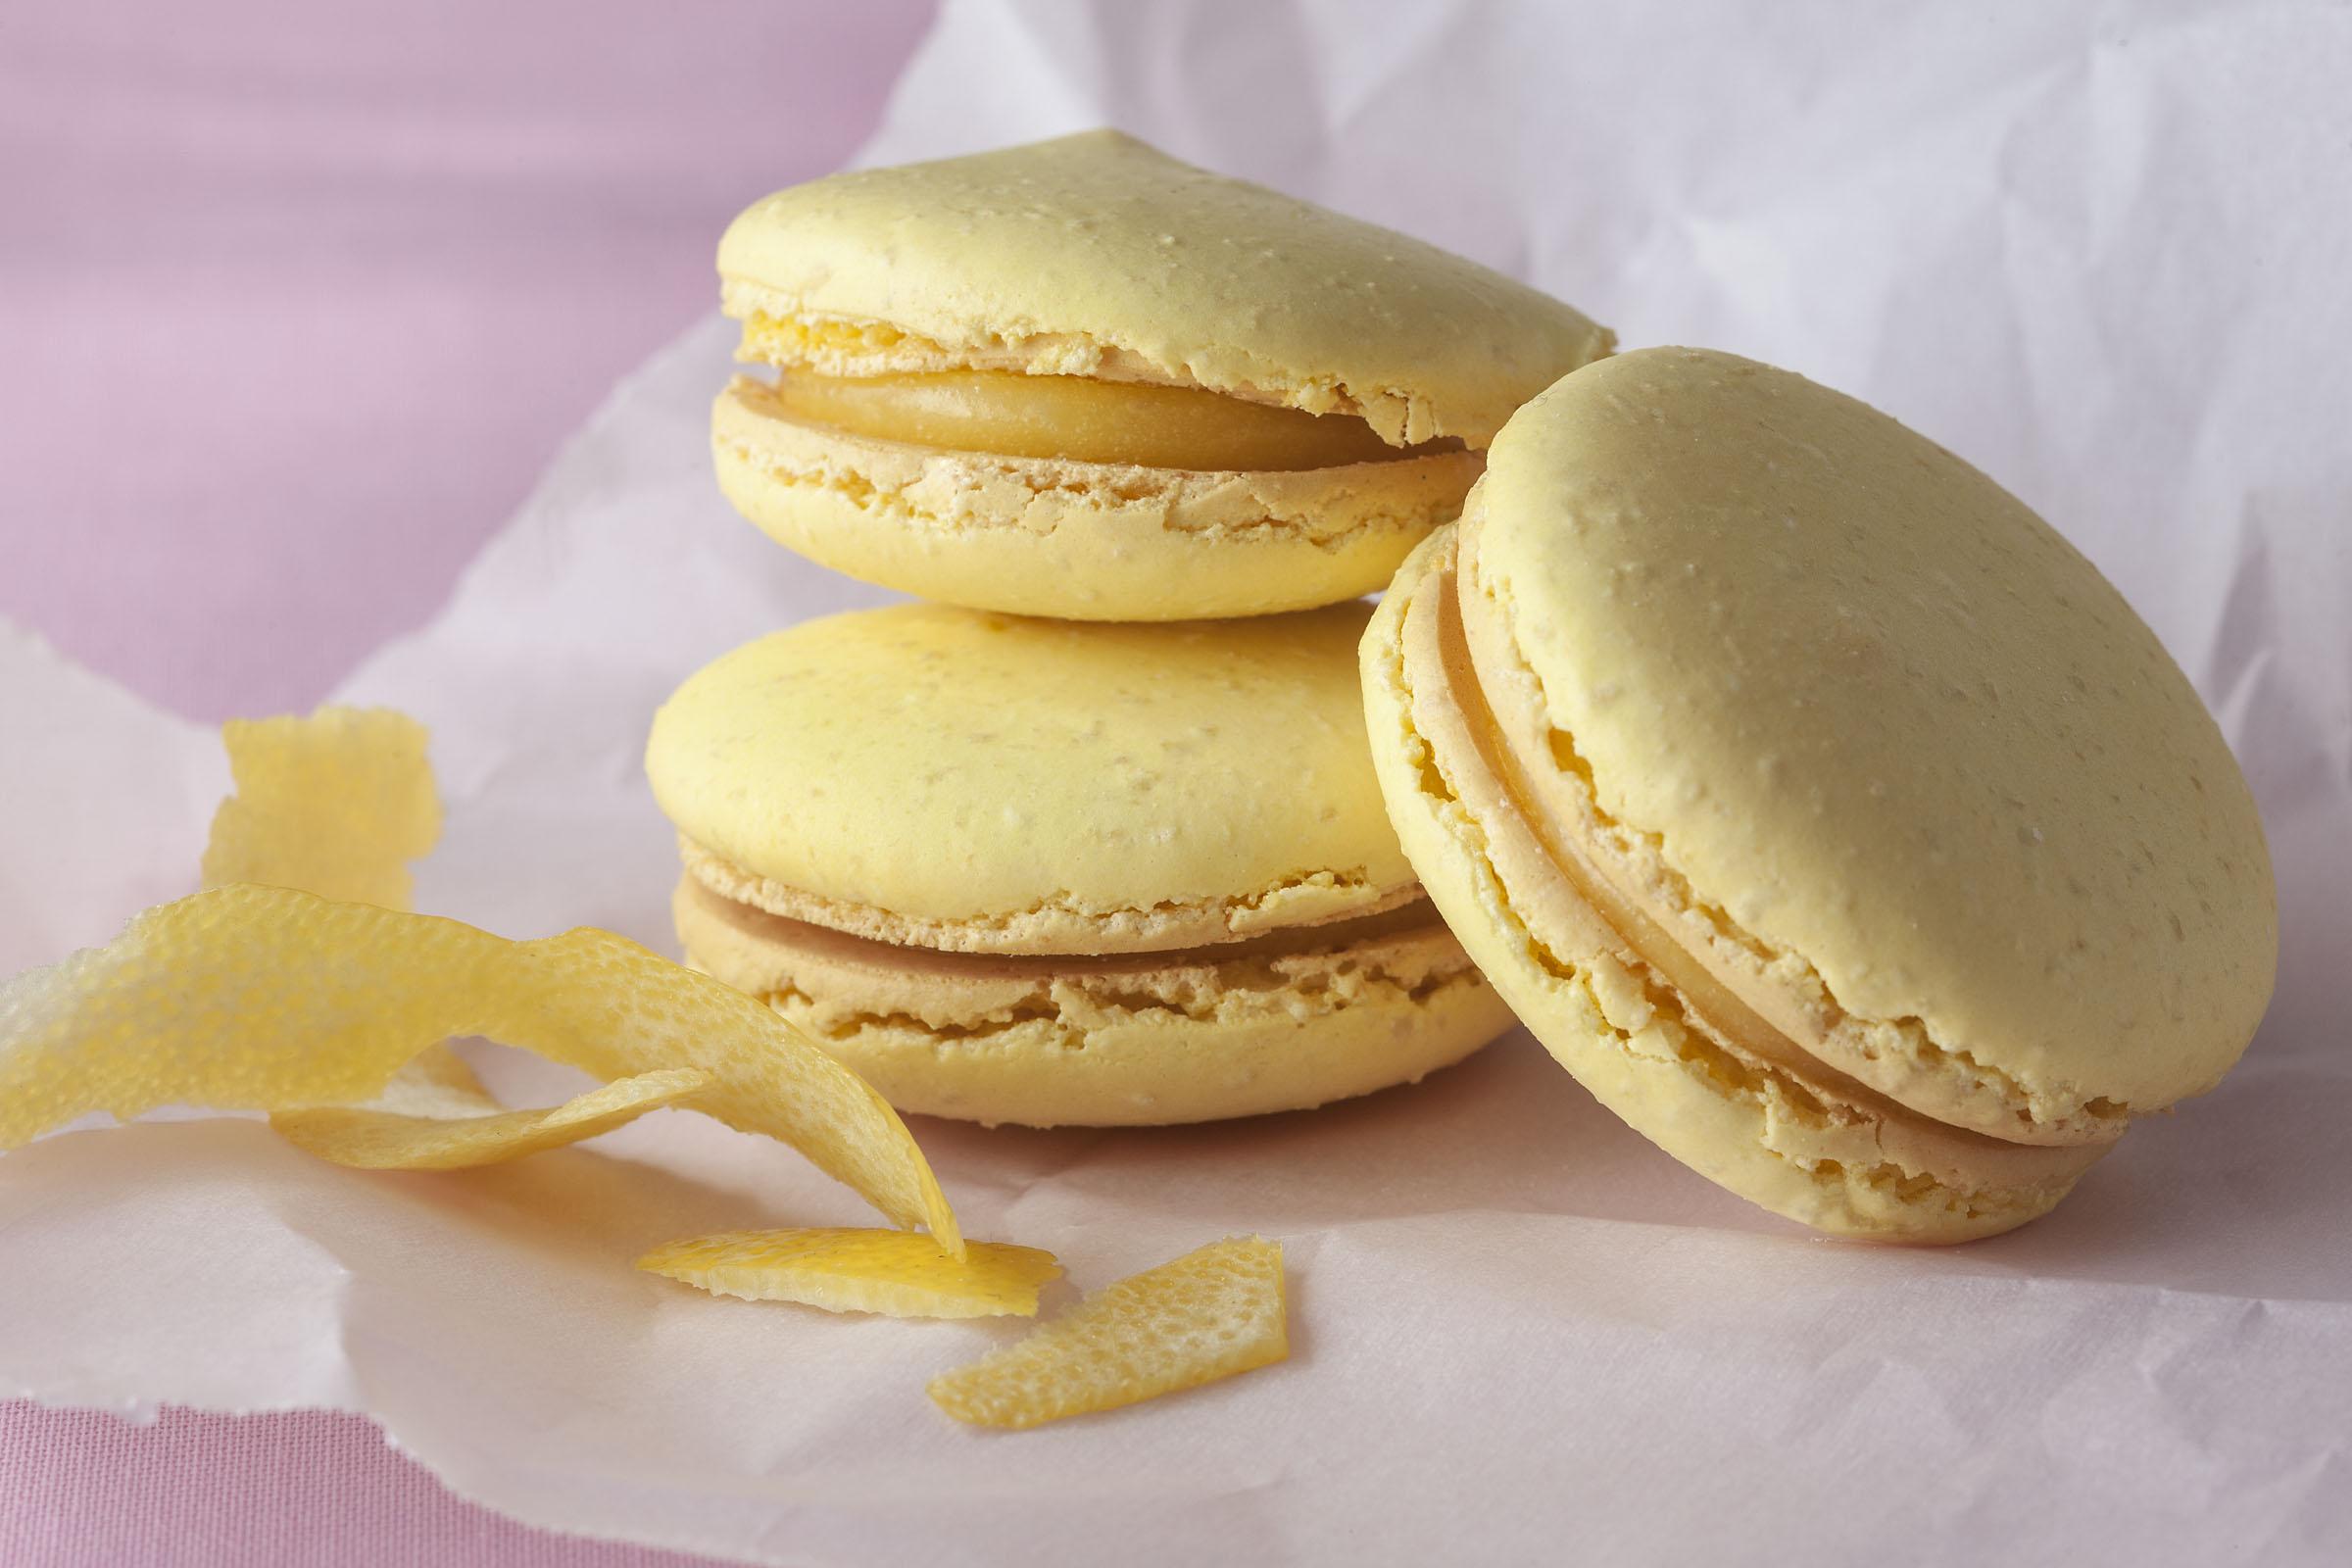 Lemon French Macaron